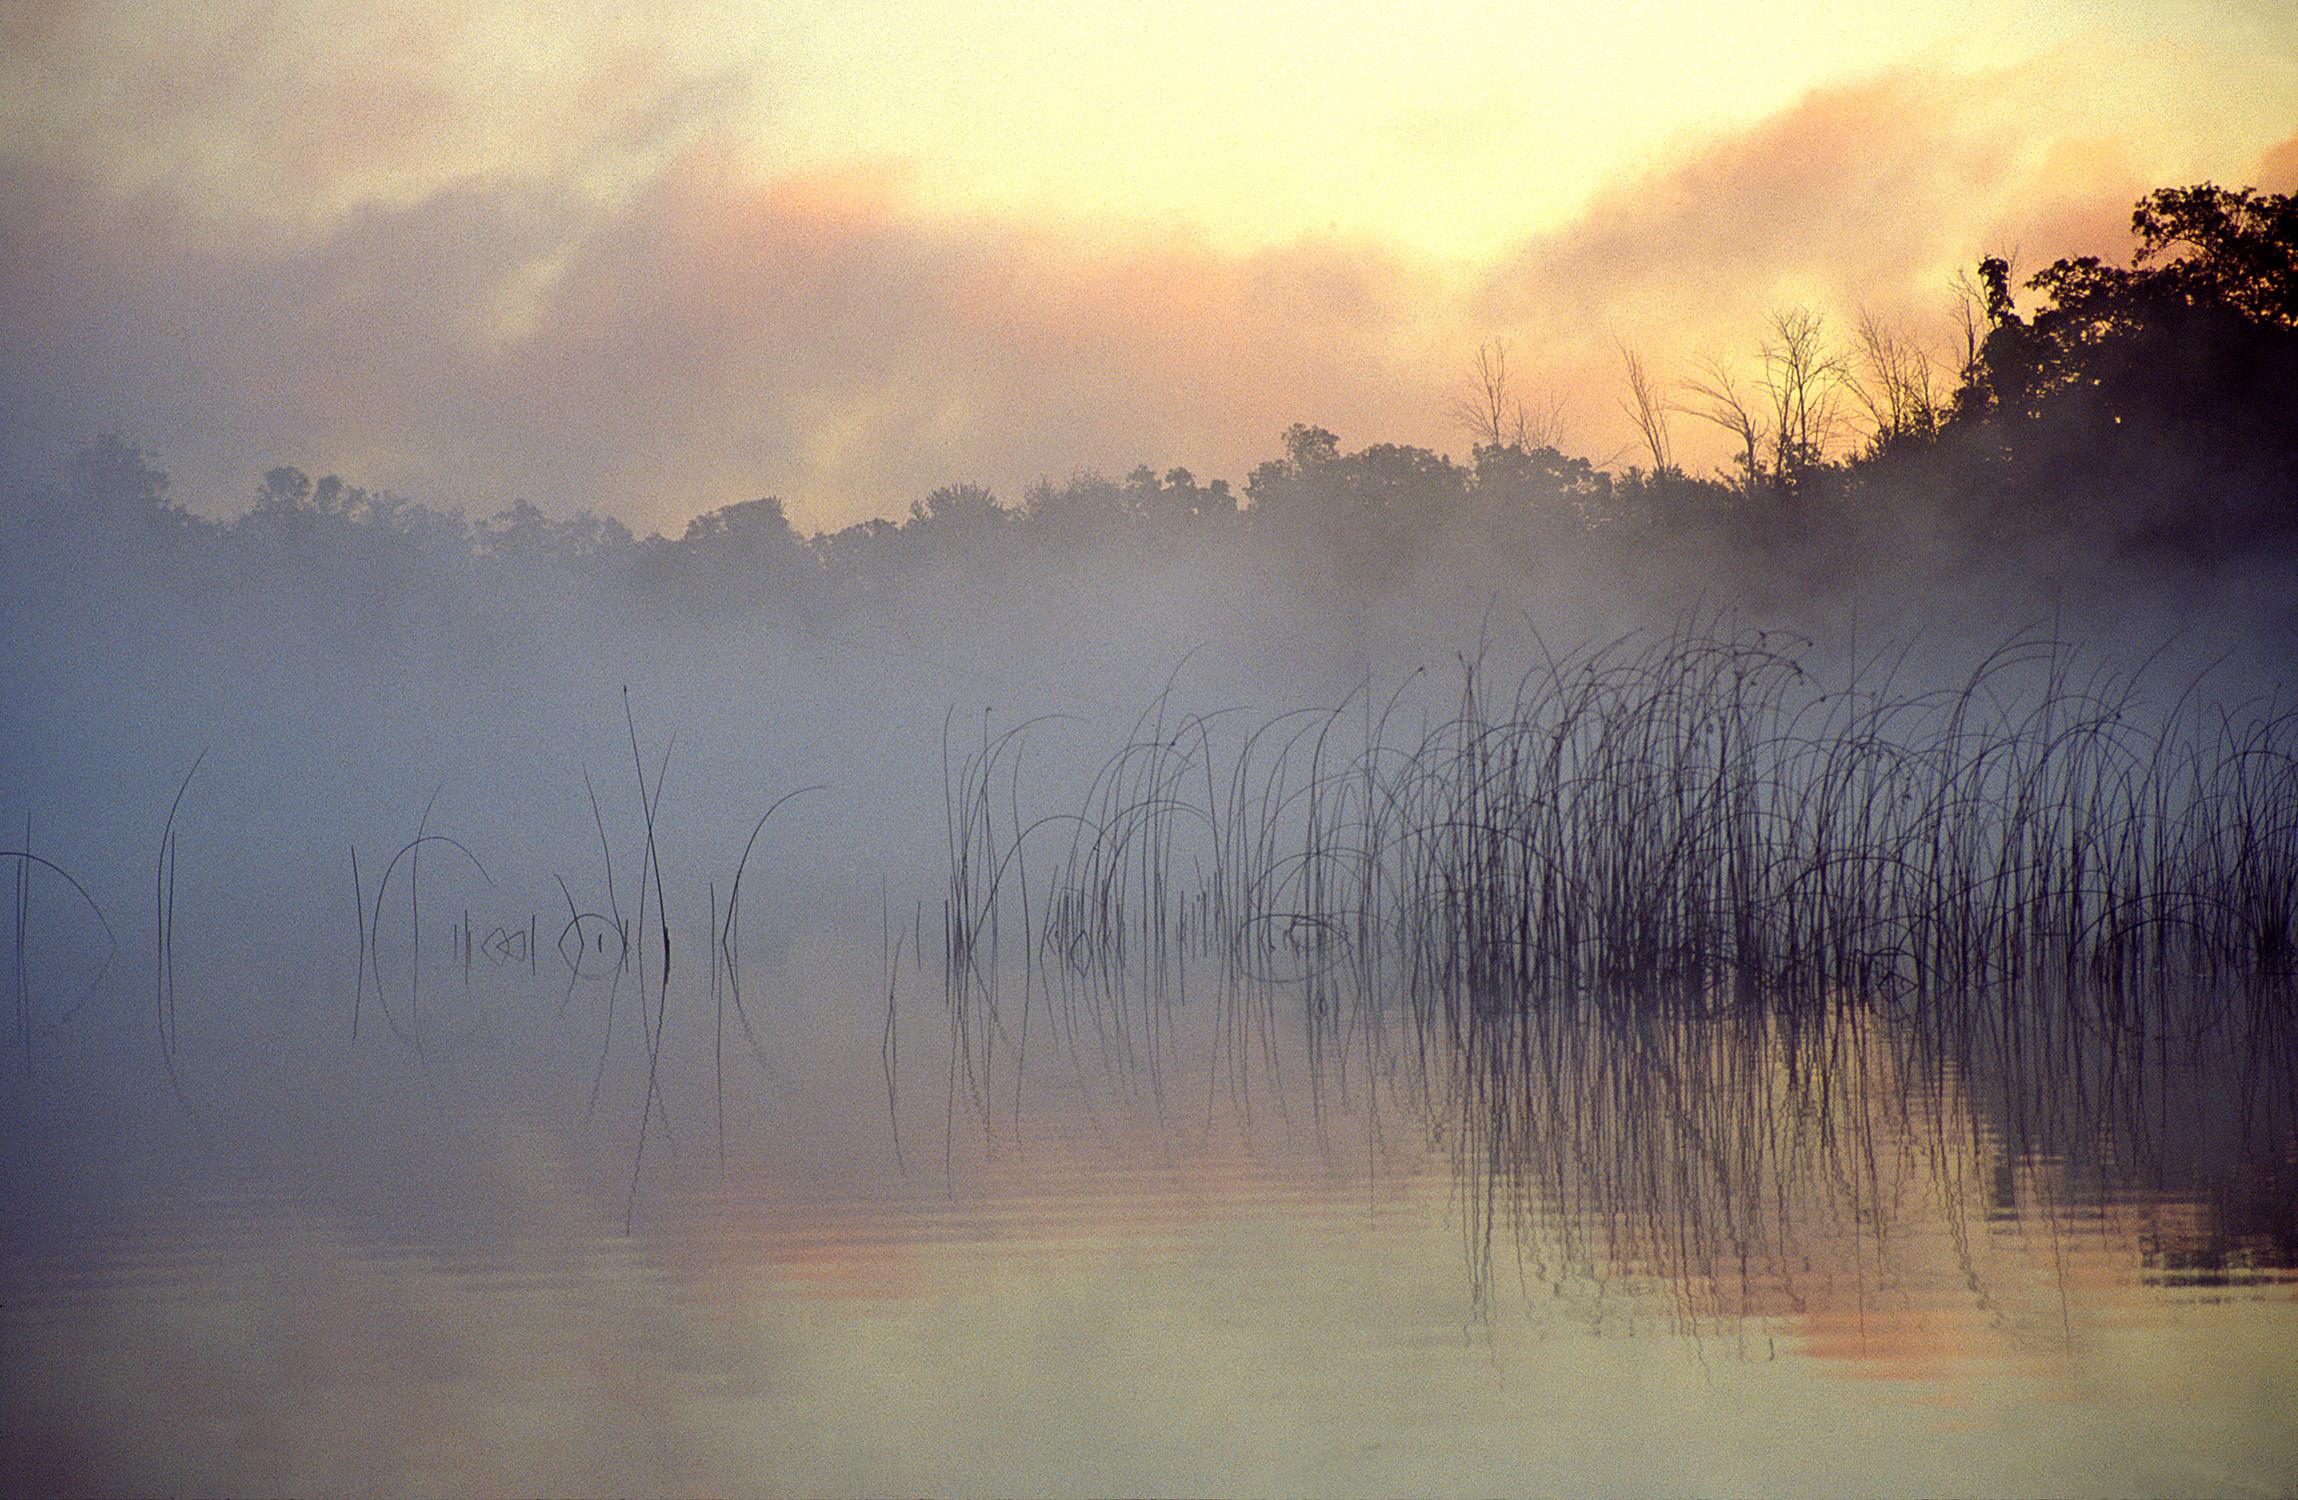 Sunrise and Fog #2, Michigan